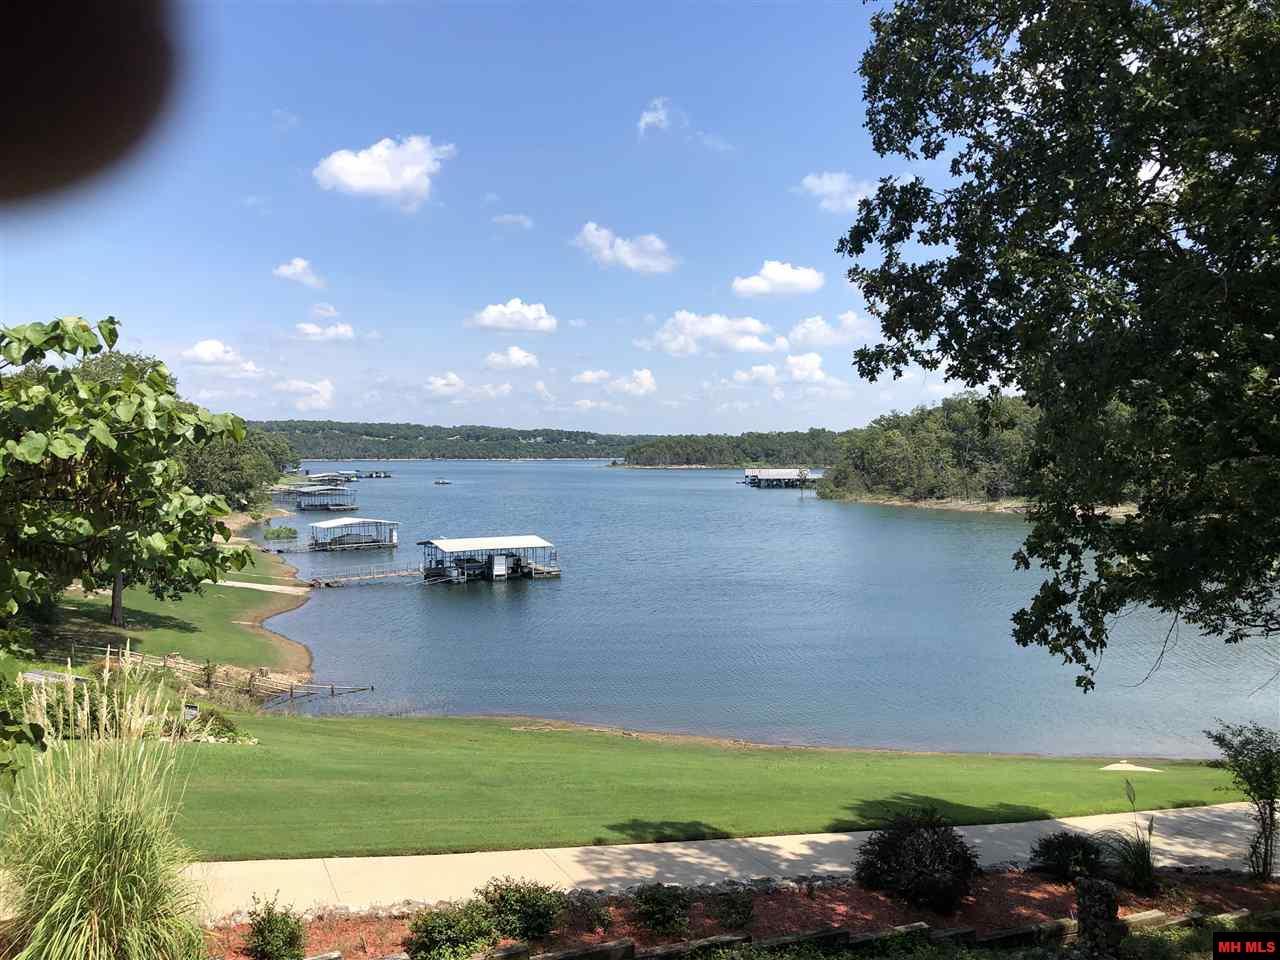 Real Estate and Homes For Sale near Lake Norfork, Arkansas